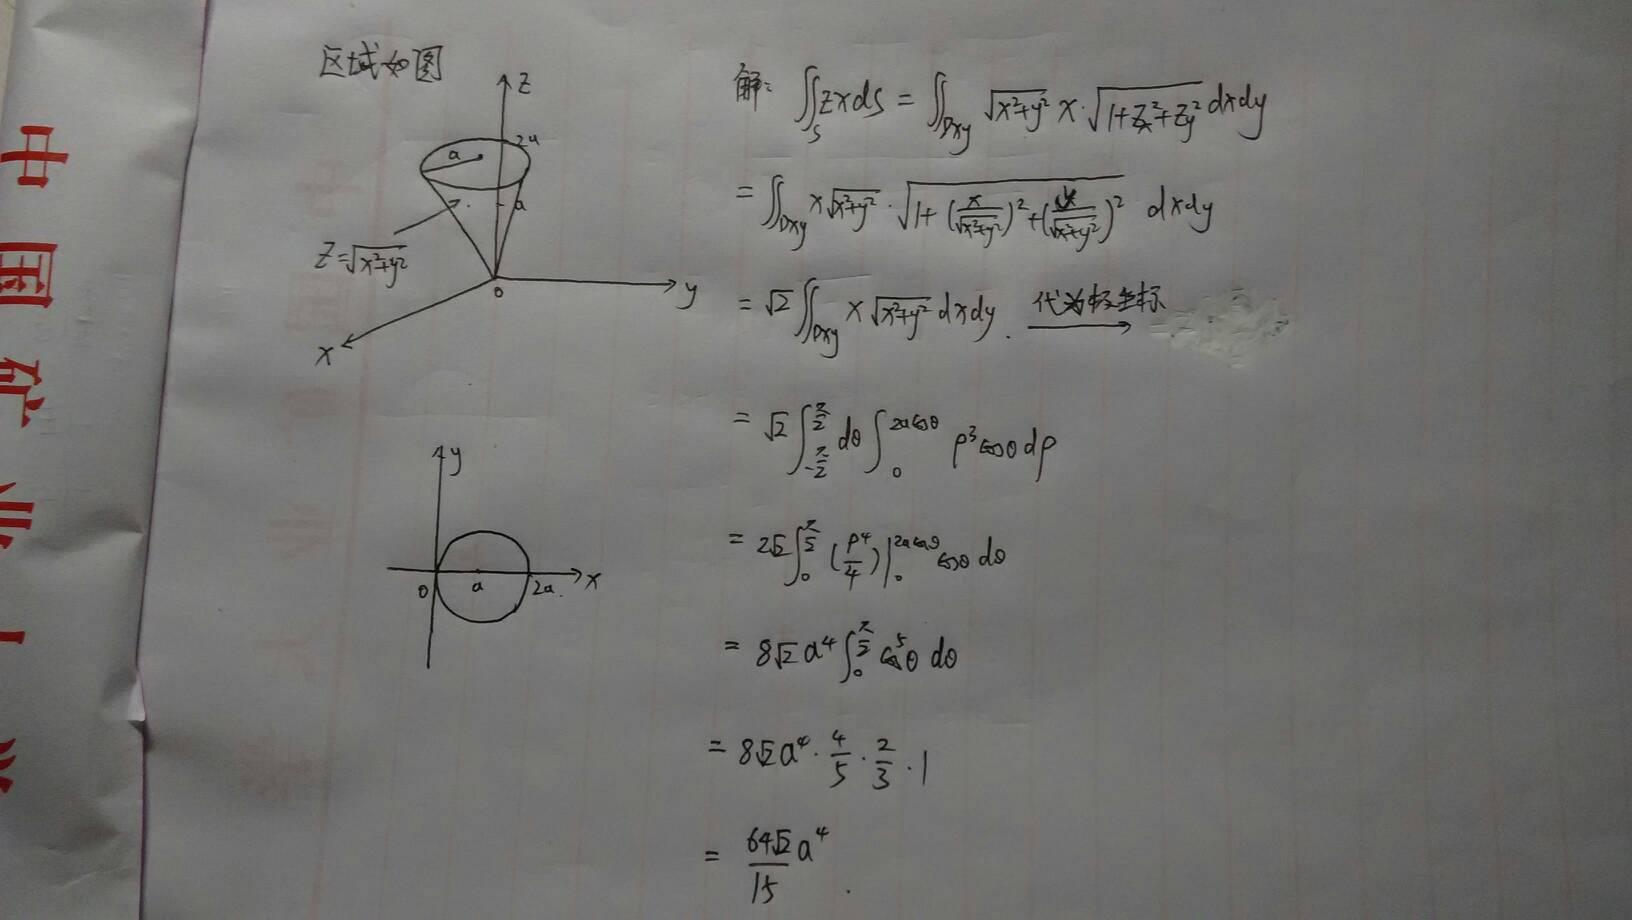 �zf��b-��#y.'z(�_计算∫∫zxds其中是锥面z=√(x^2 y^2) 被柱面x2 y2=2